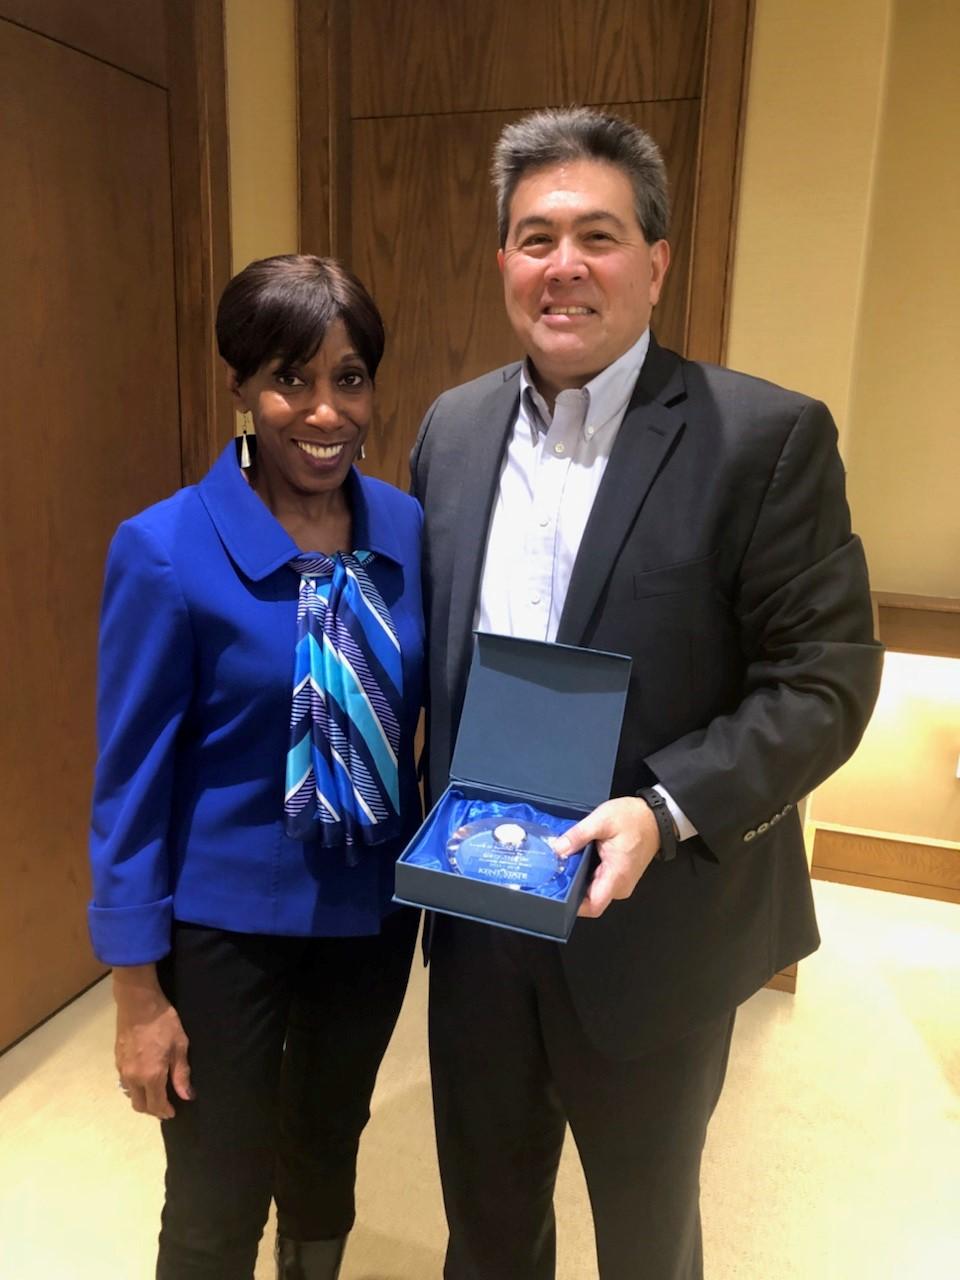 Alfreda Brown awards Gary Stiffler DAB Achievement Award